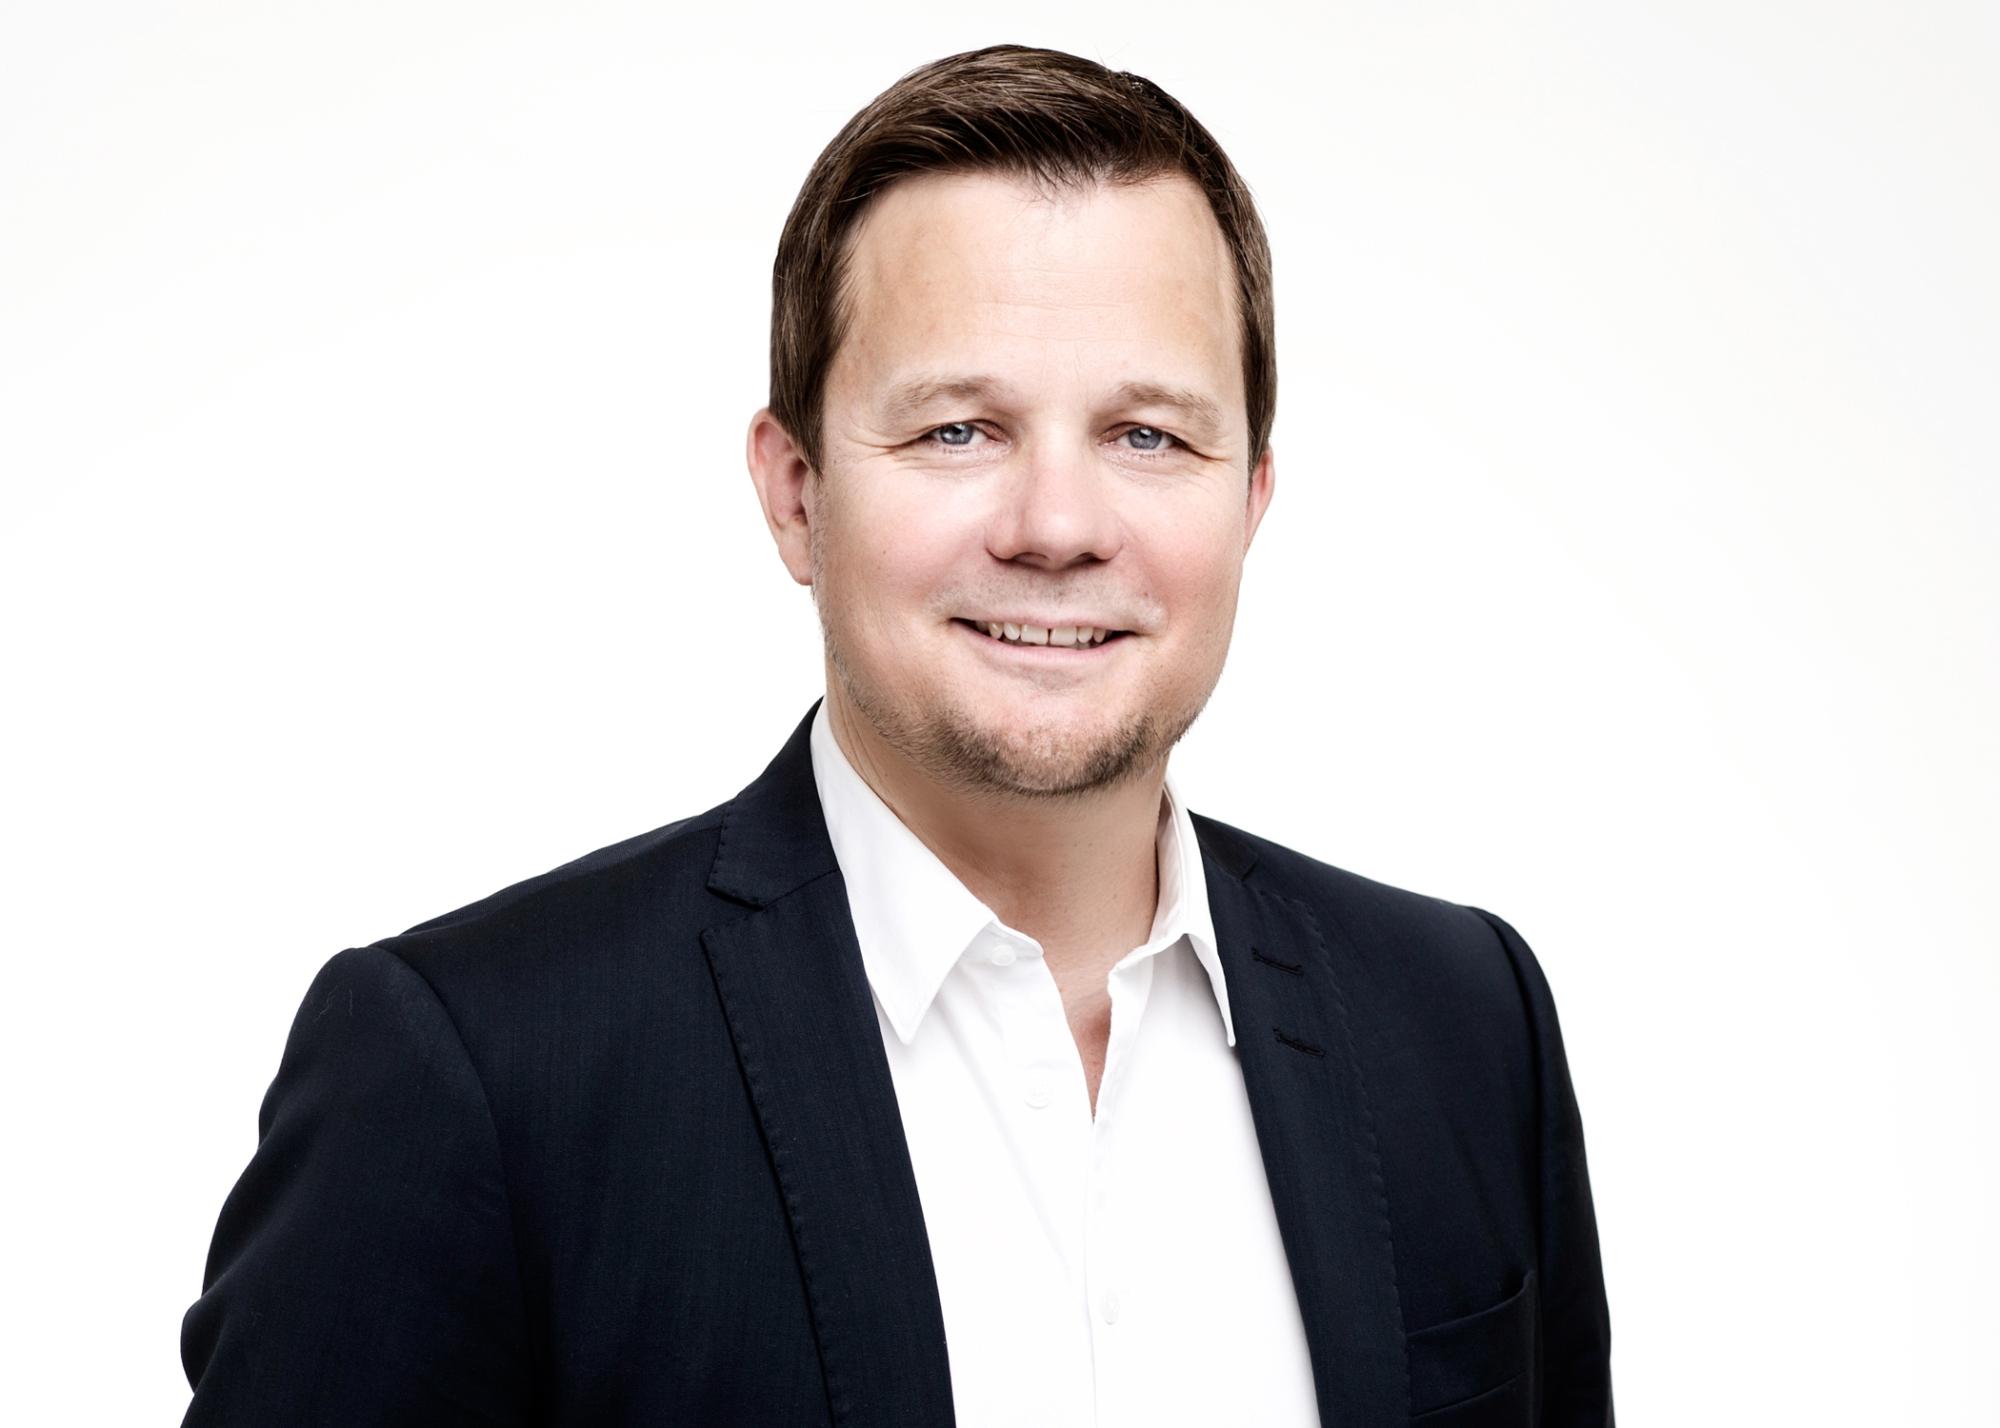 Roland Fiege, IPG Mediabrands